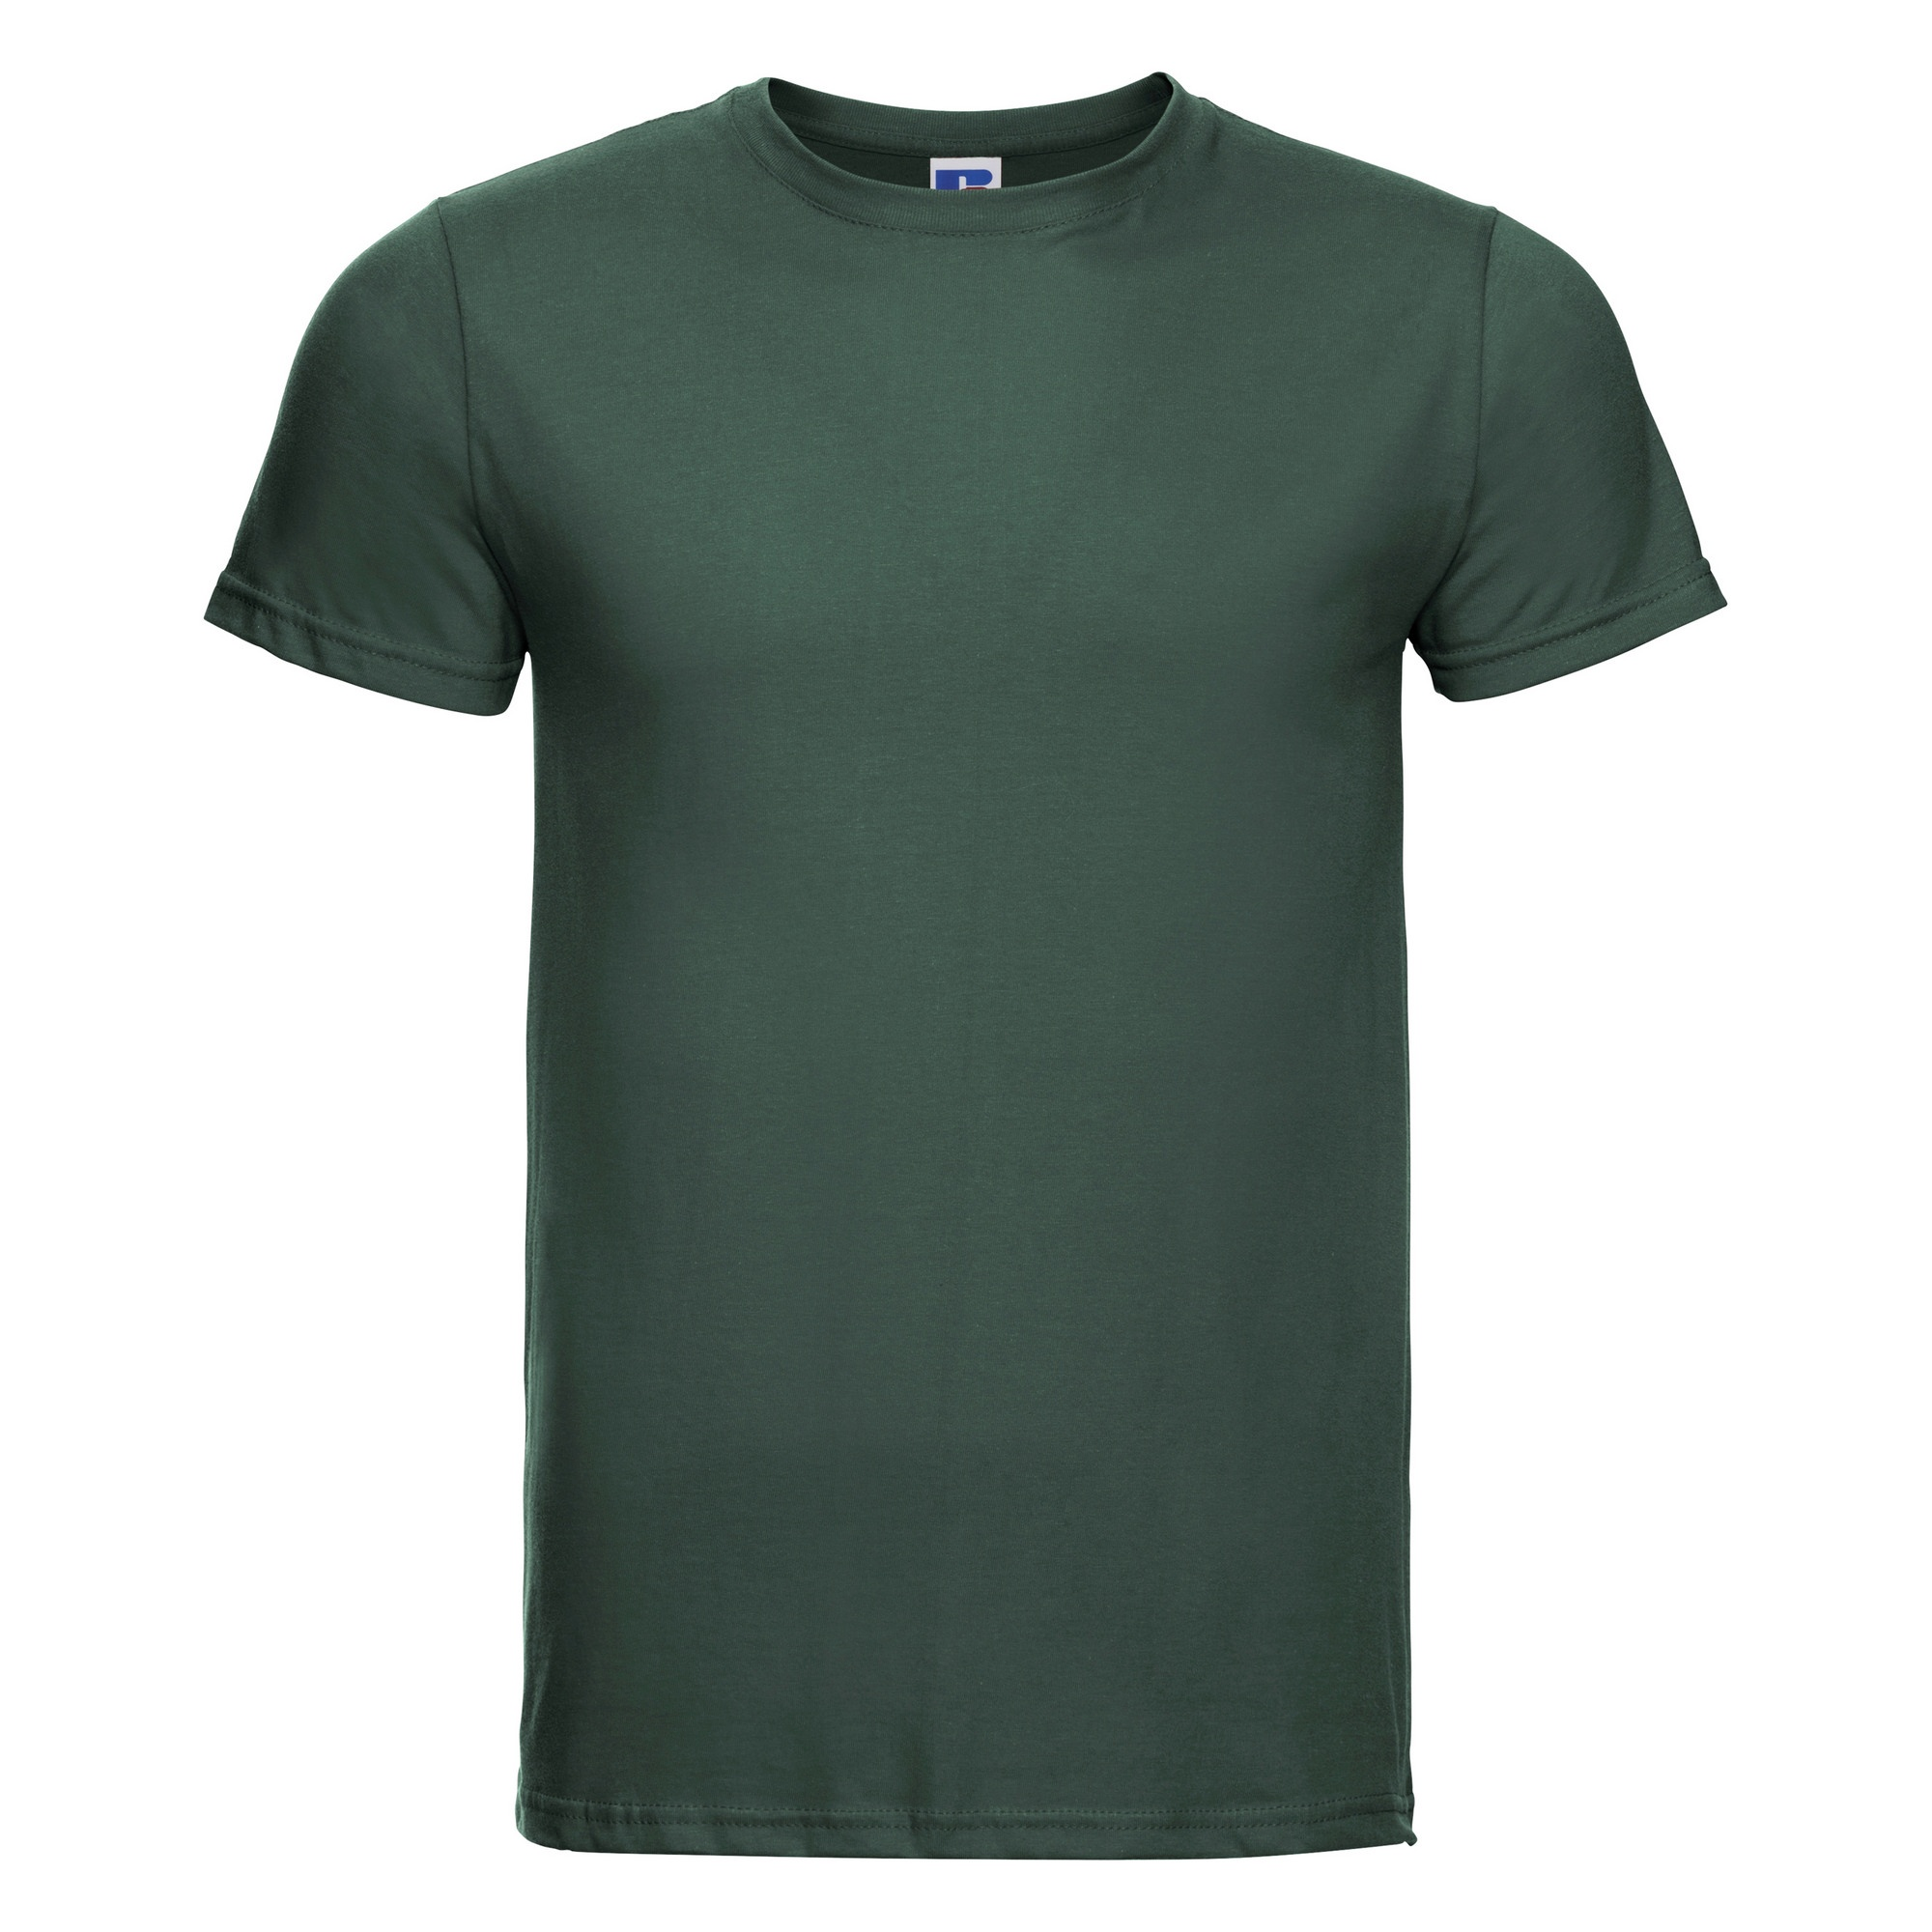 Russell-Mens-Slim-Plain-Blank-100-Cotton-Short-Sleeve-T-Shirt-Tee-BC1515 thumbnail 4